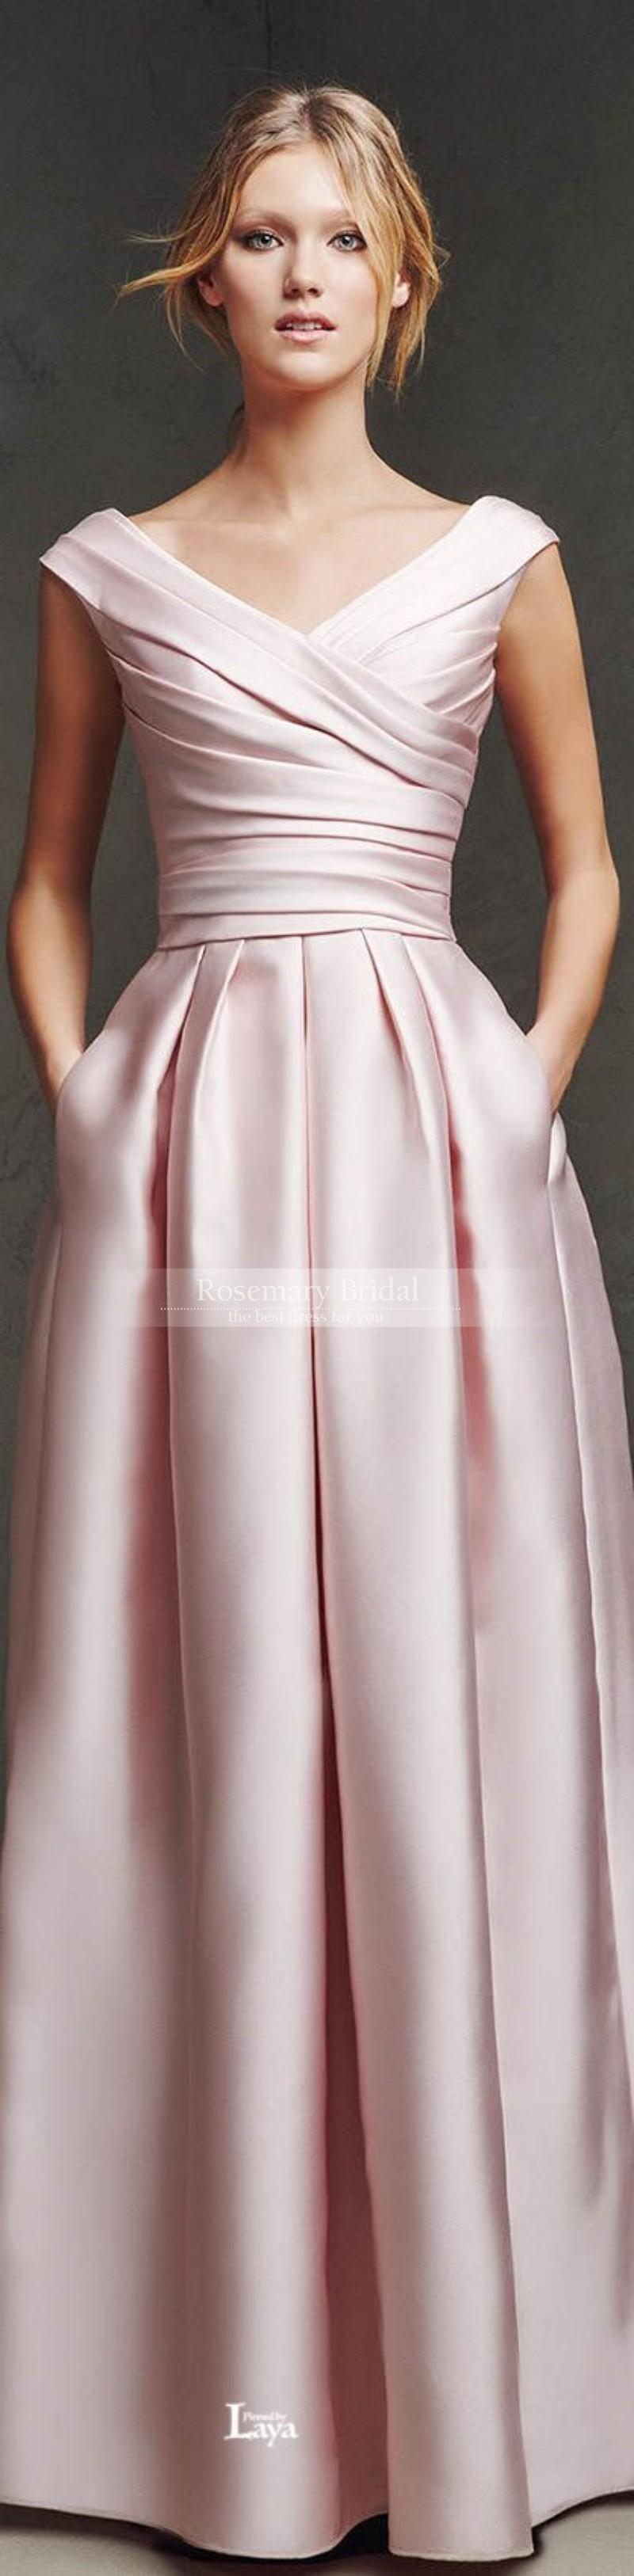 04cd6e66d91 Elegant Winter 2016 Pleats A Line V Neck Cap Sleeve LOng Floor Length Pink  Satin Wedding Bridesmaid Dresses Custom Made Cheap Plus Size